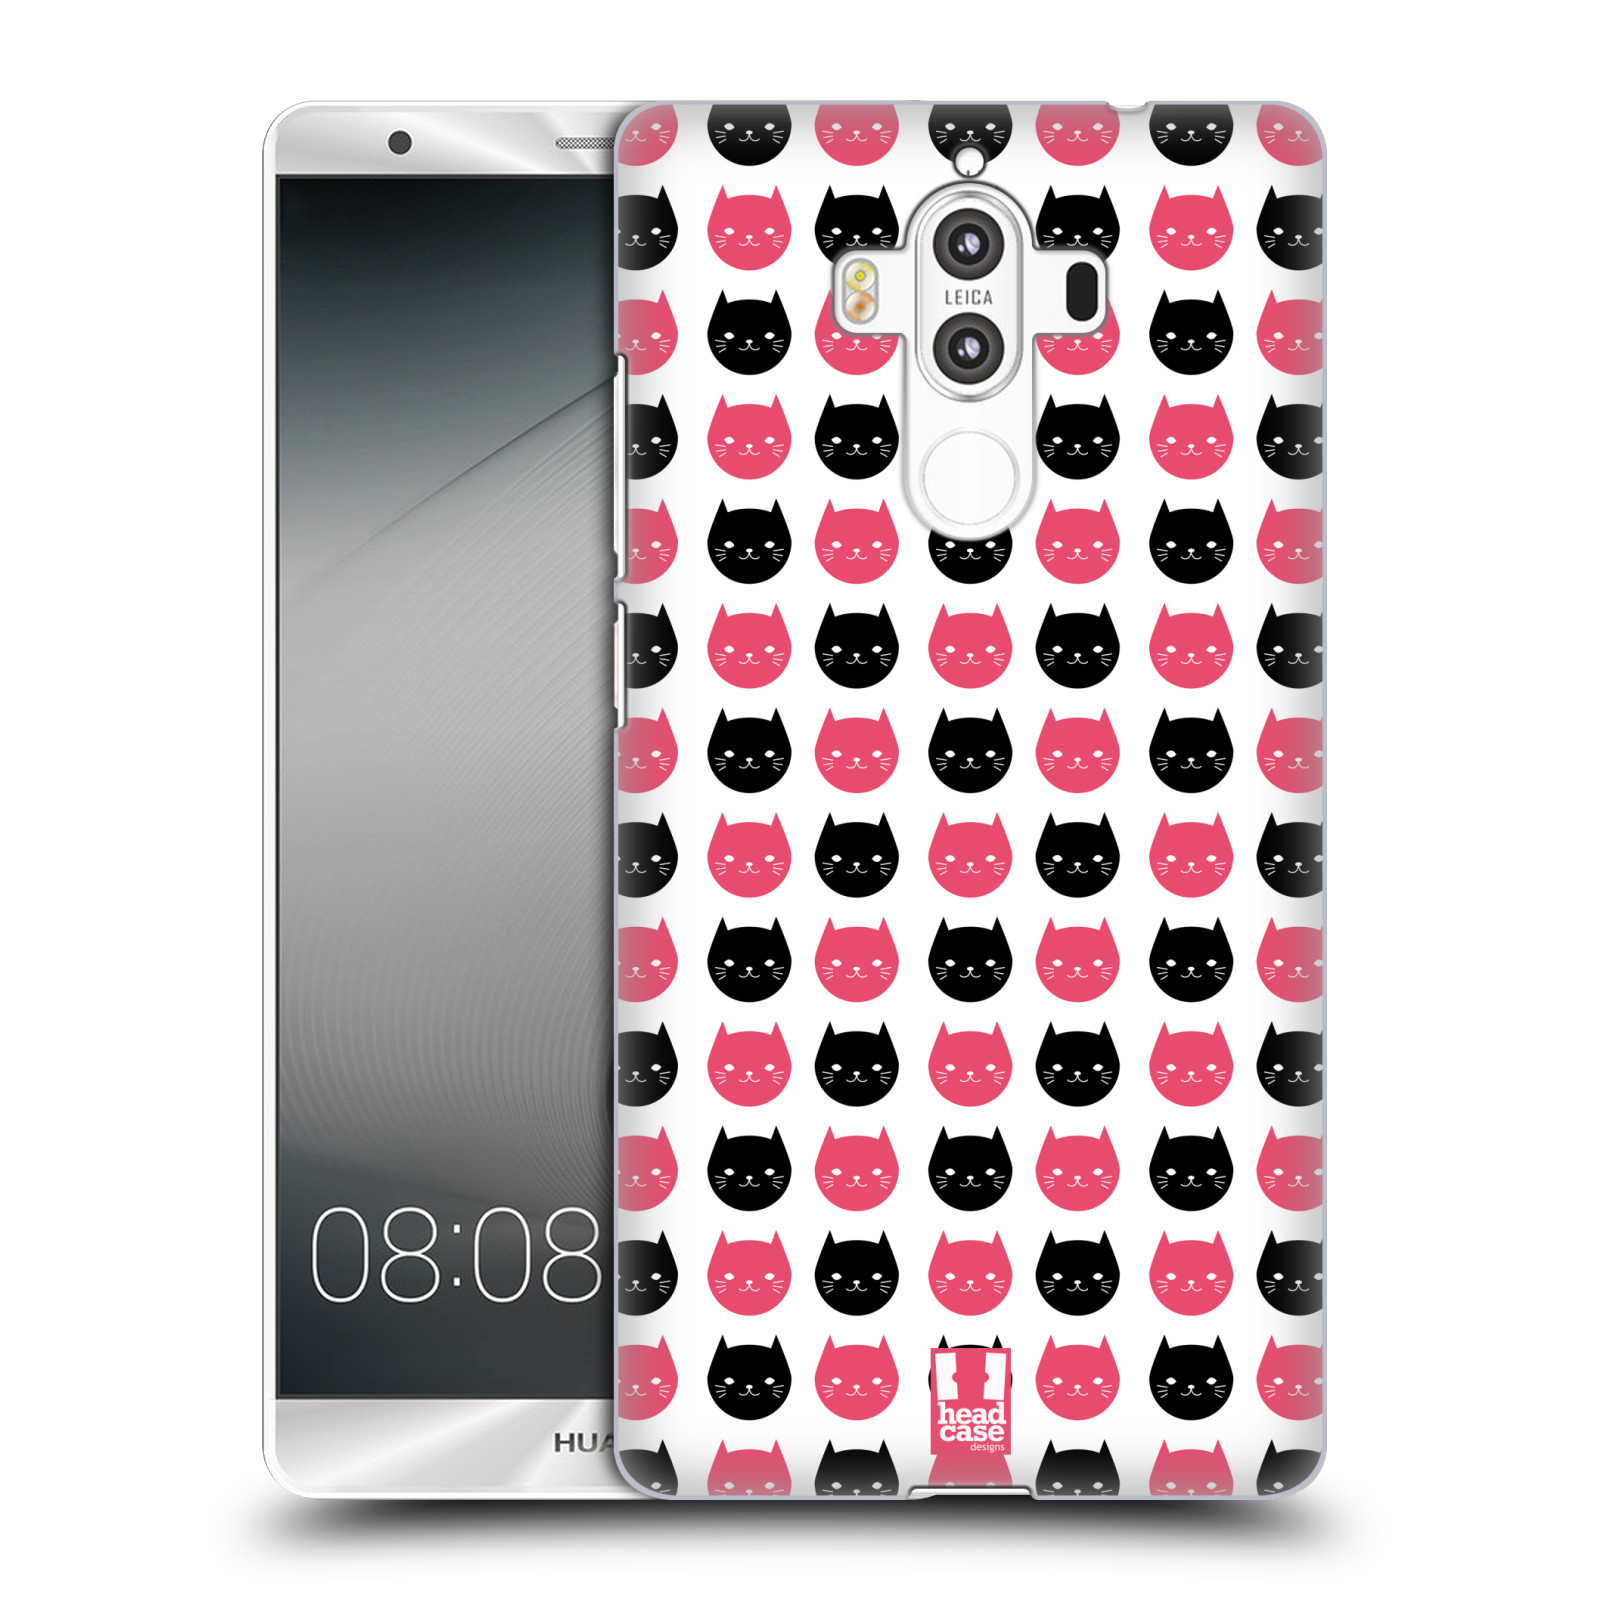 Plastové pouzdro na mobil Huawei Mate 9 - Head Case KOČKY Black and Pink (Plastový kryt či obal na mobilní telefon Huawei Mate 9 (Dual SIM))